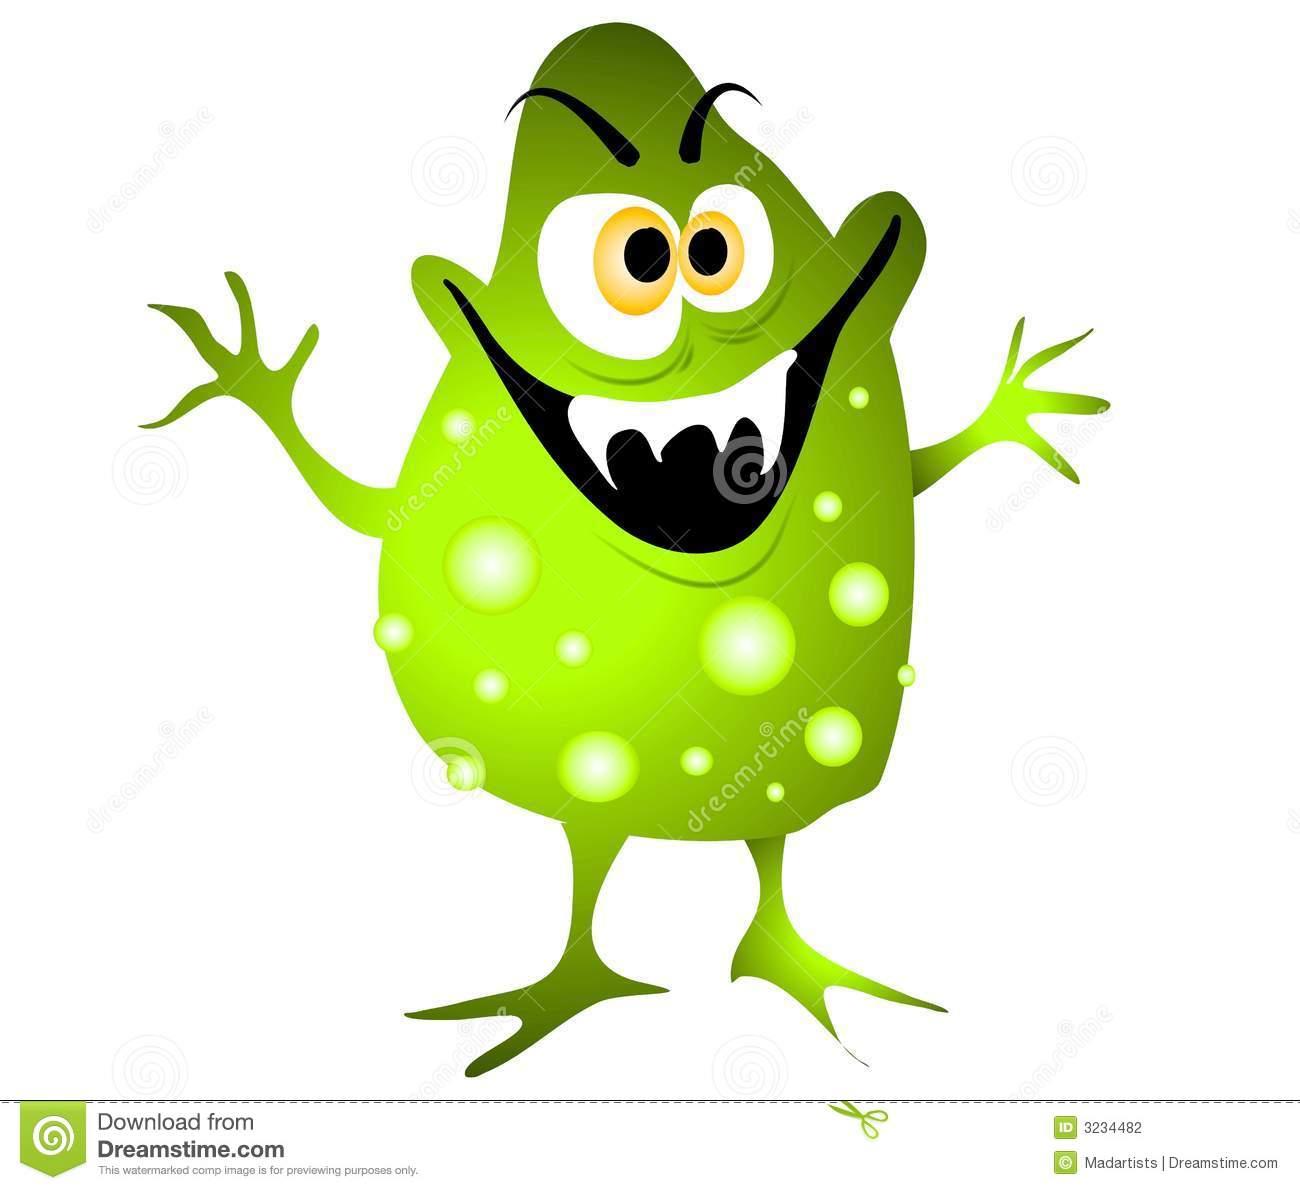 Clip Art Cartoon Illustration Of A Nasty Looking Germ Virus Or